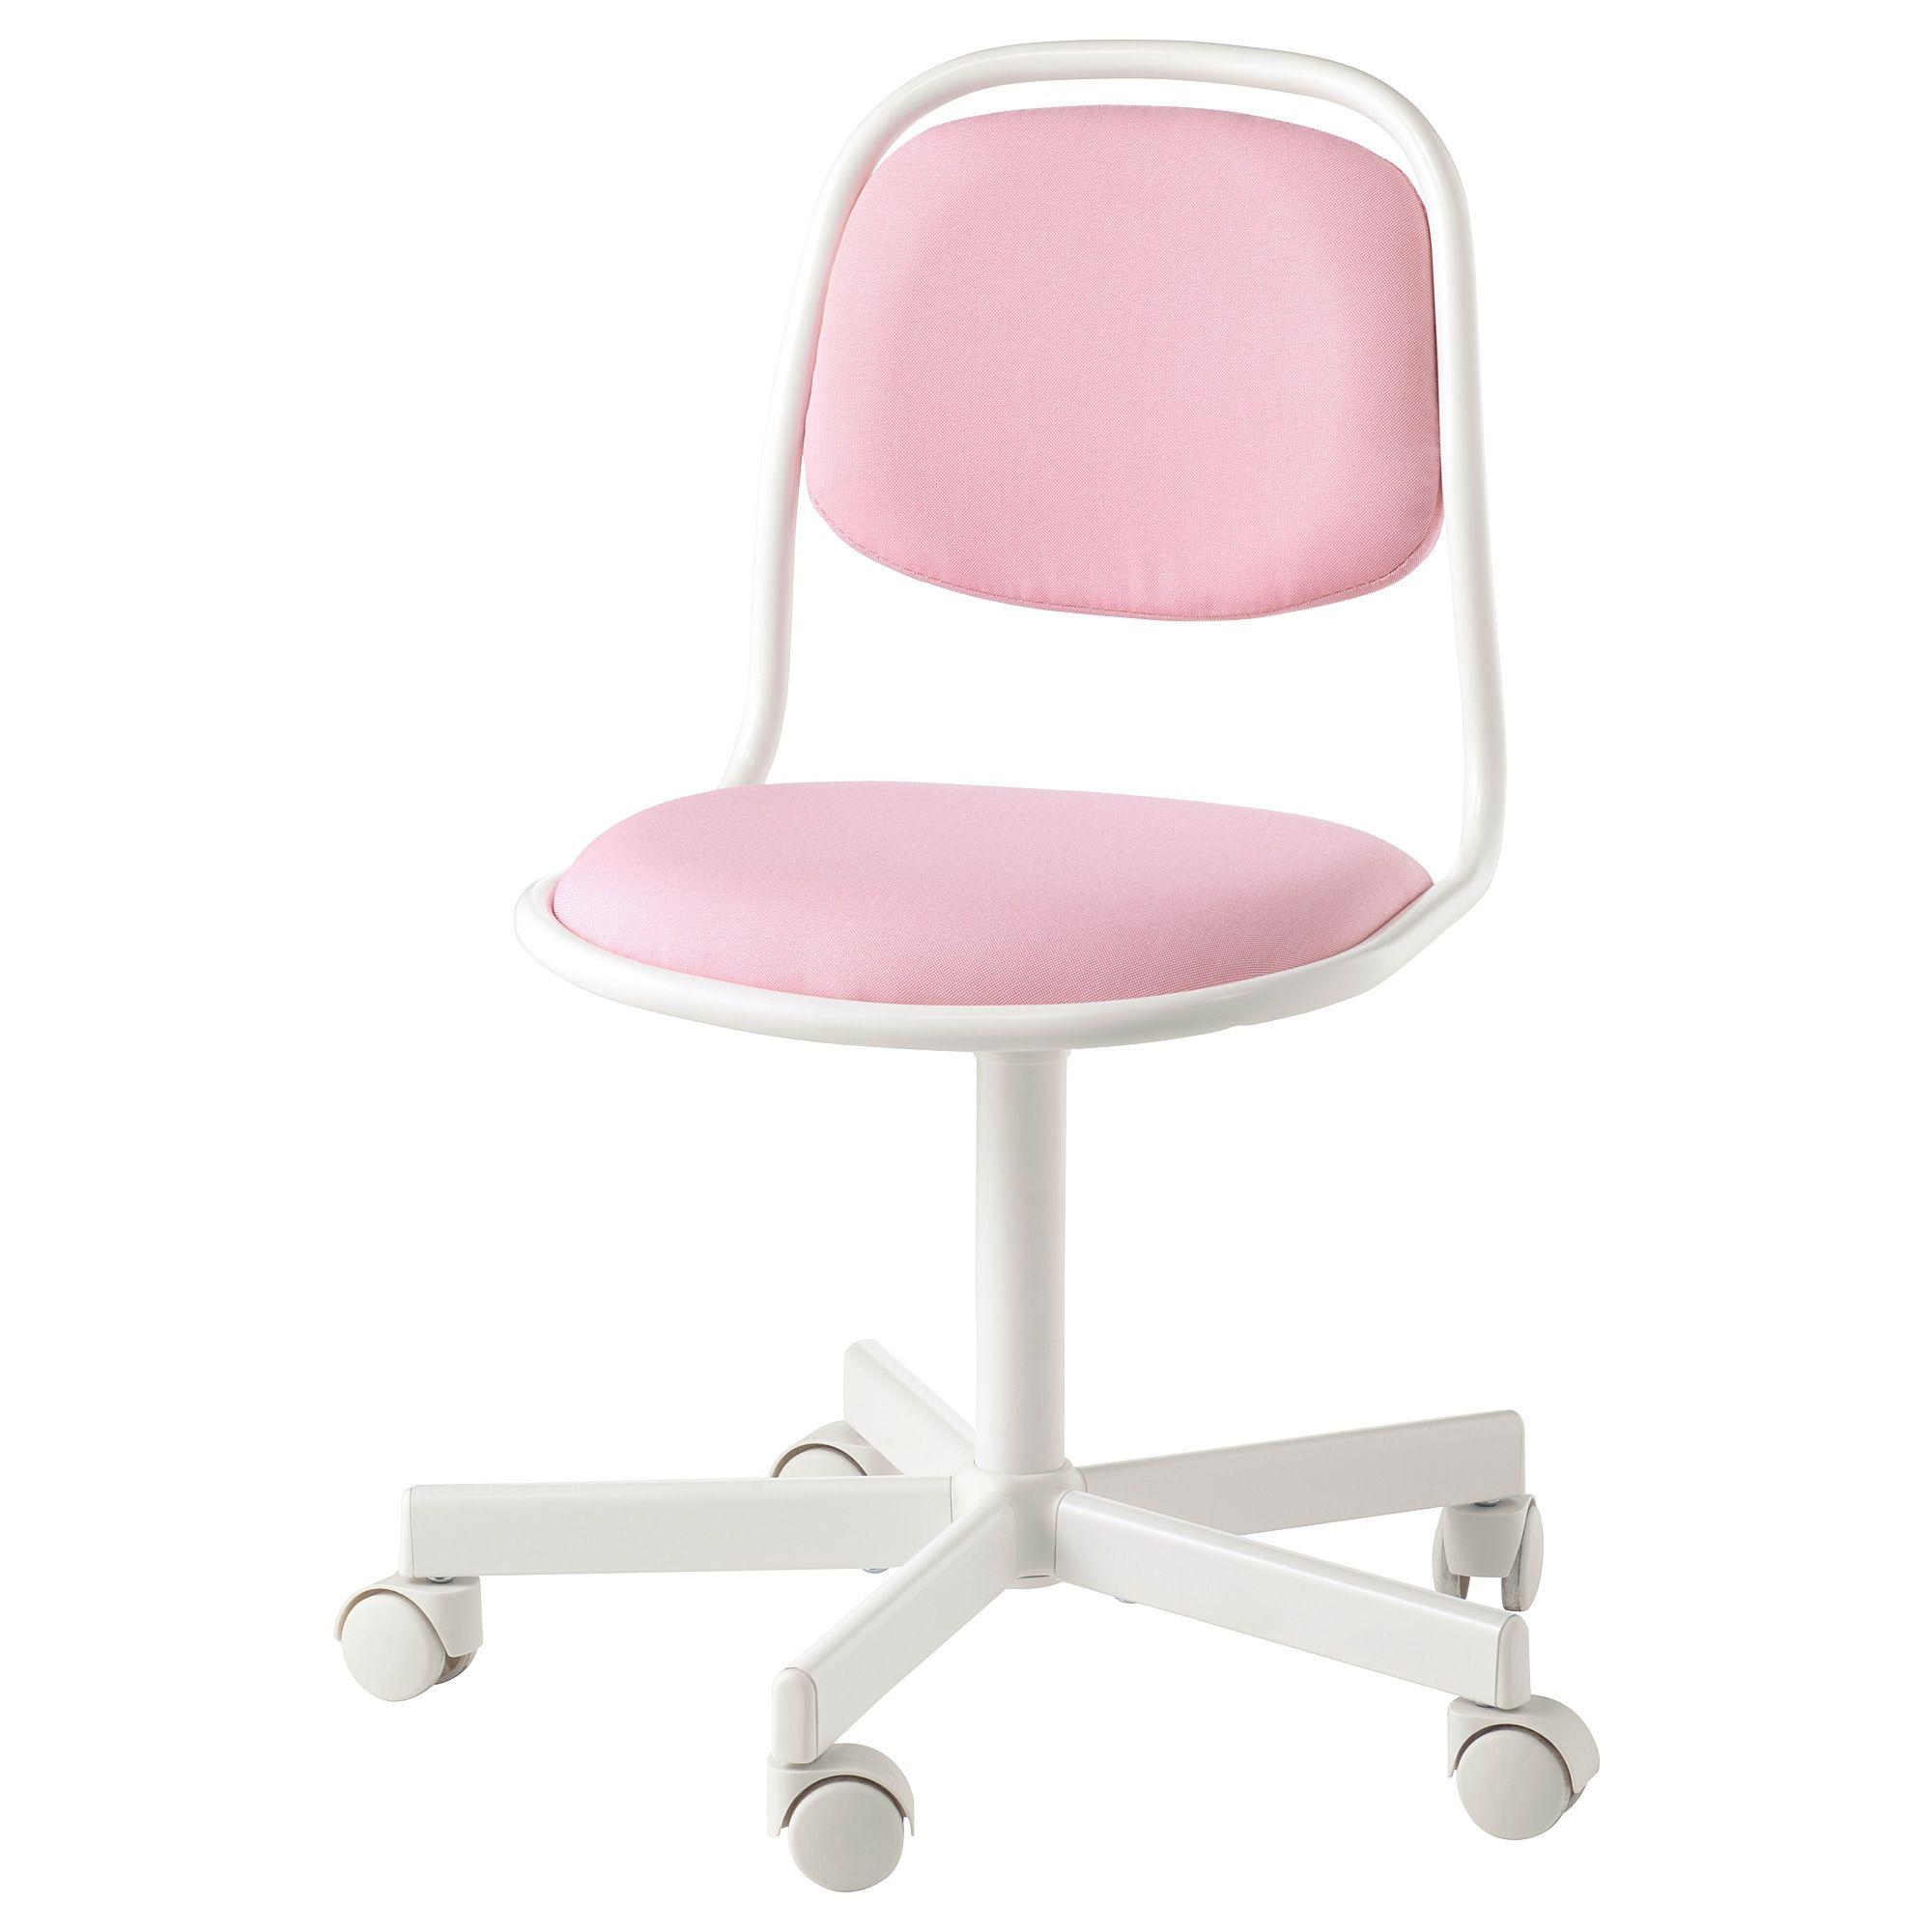 Orfjall Child S Desk Chair White Vissle Pink Ikea Childrens Desk And Chair Pink Desk Chair Childrens Desk